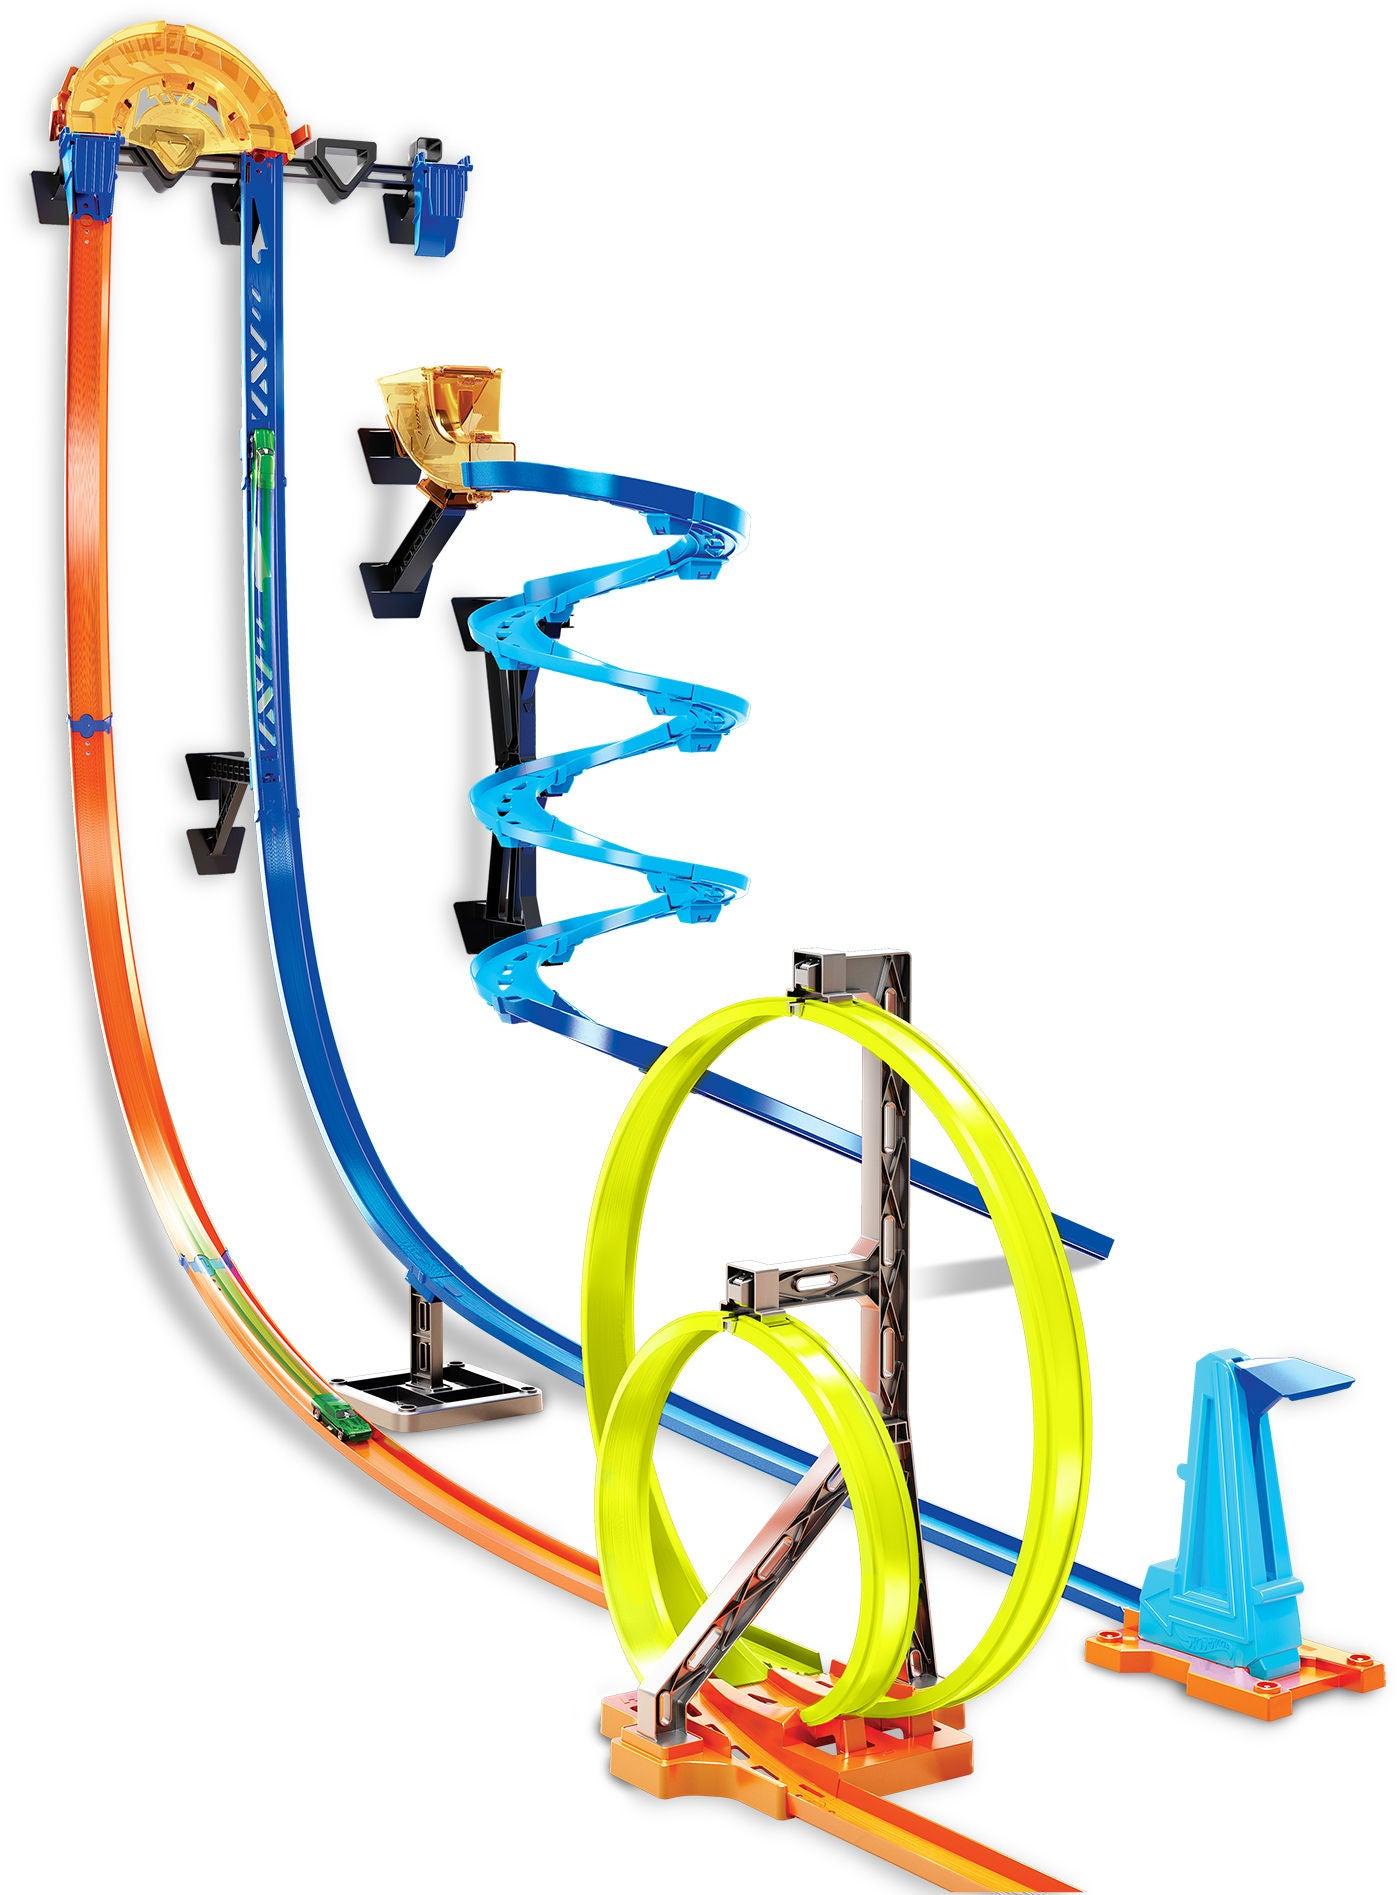 Hot Wheels Bilbana Track Builder Track Set